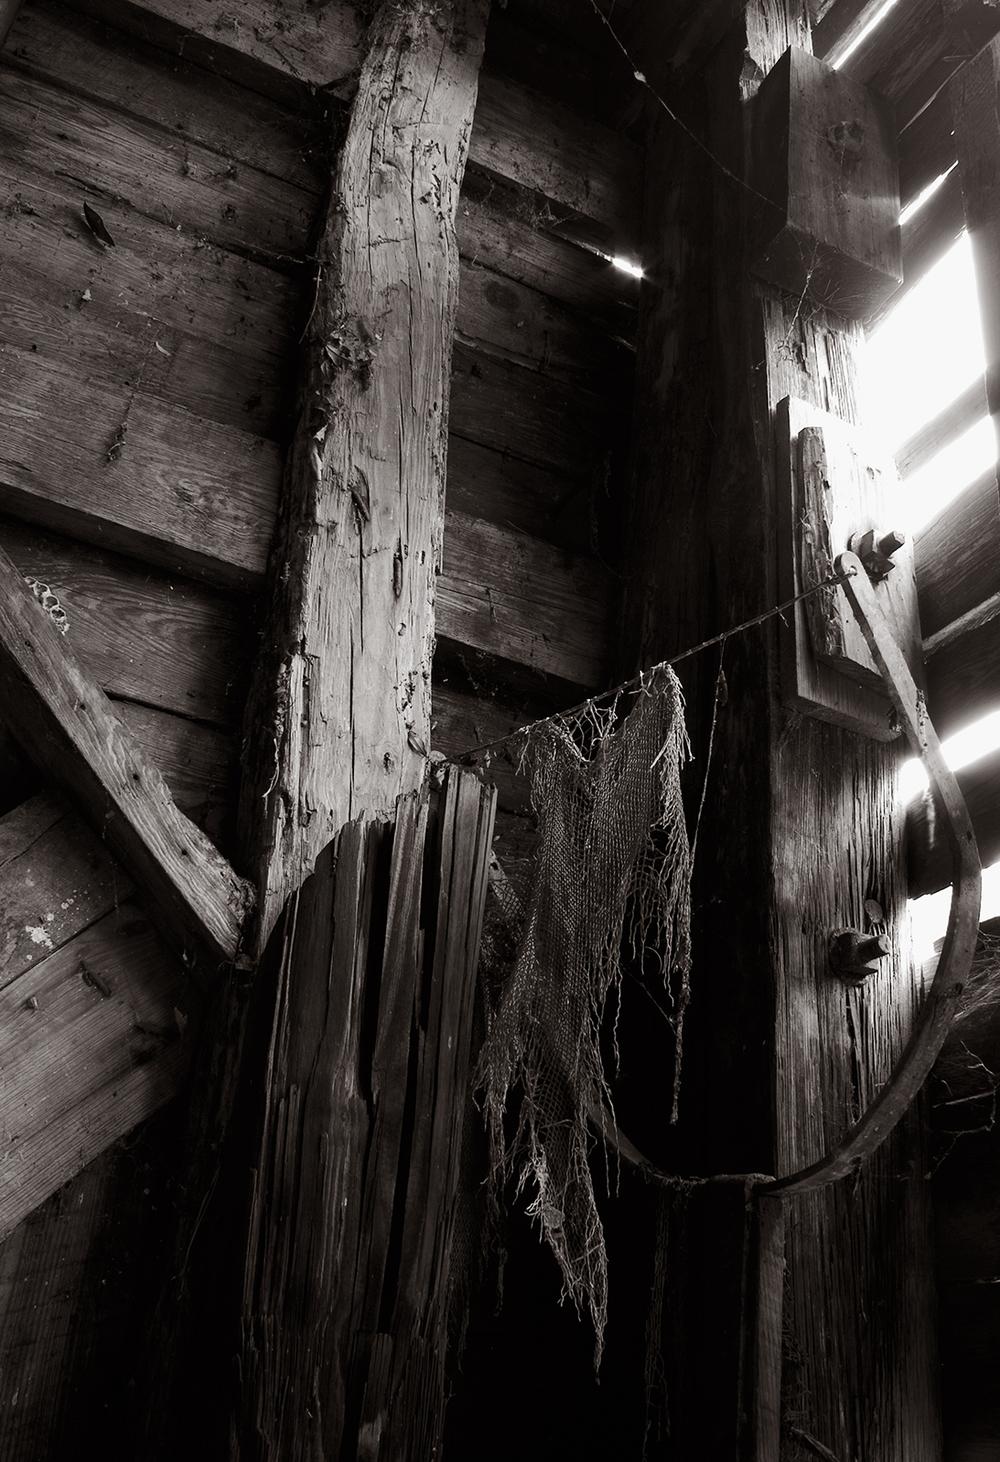 Myakka_barn_corner_BW_06.jpg